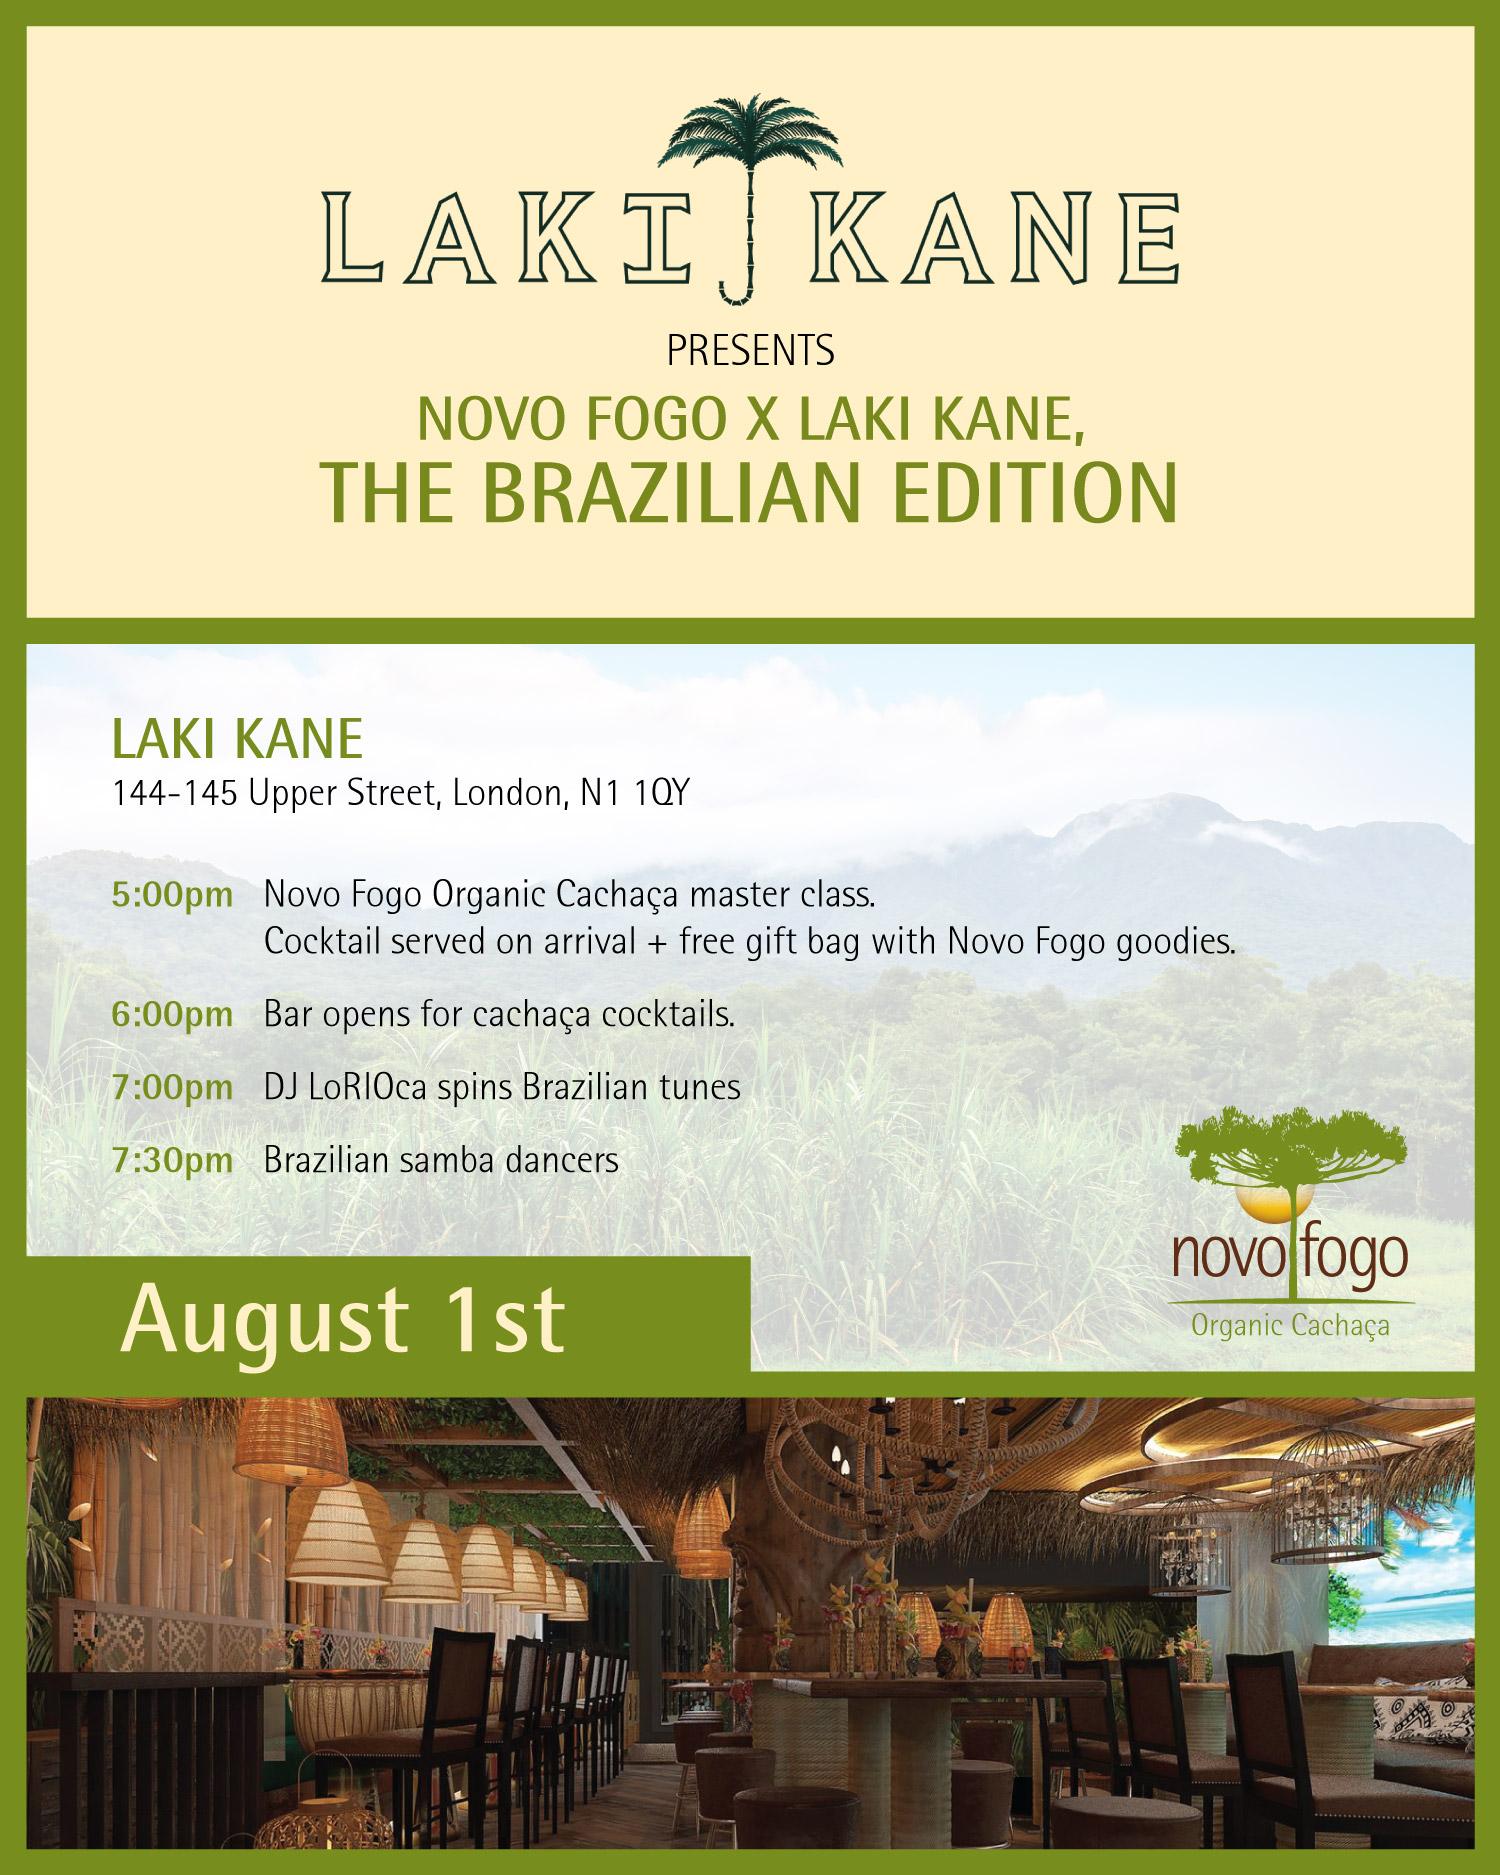 Laki Kane Novo Fogo event poster.jpg